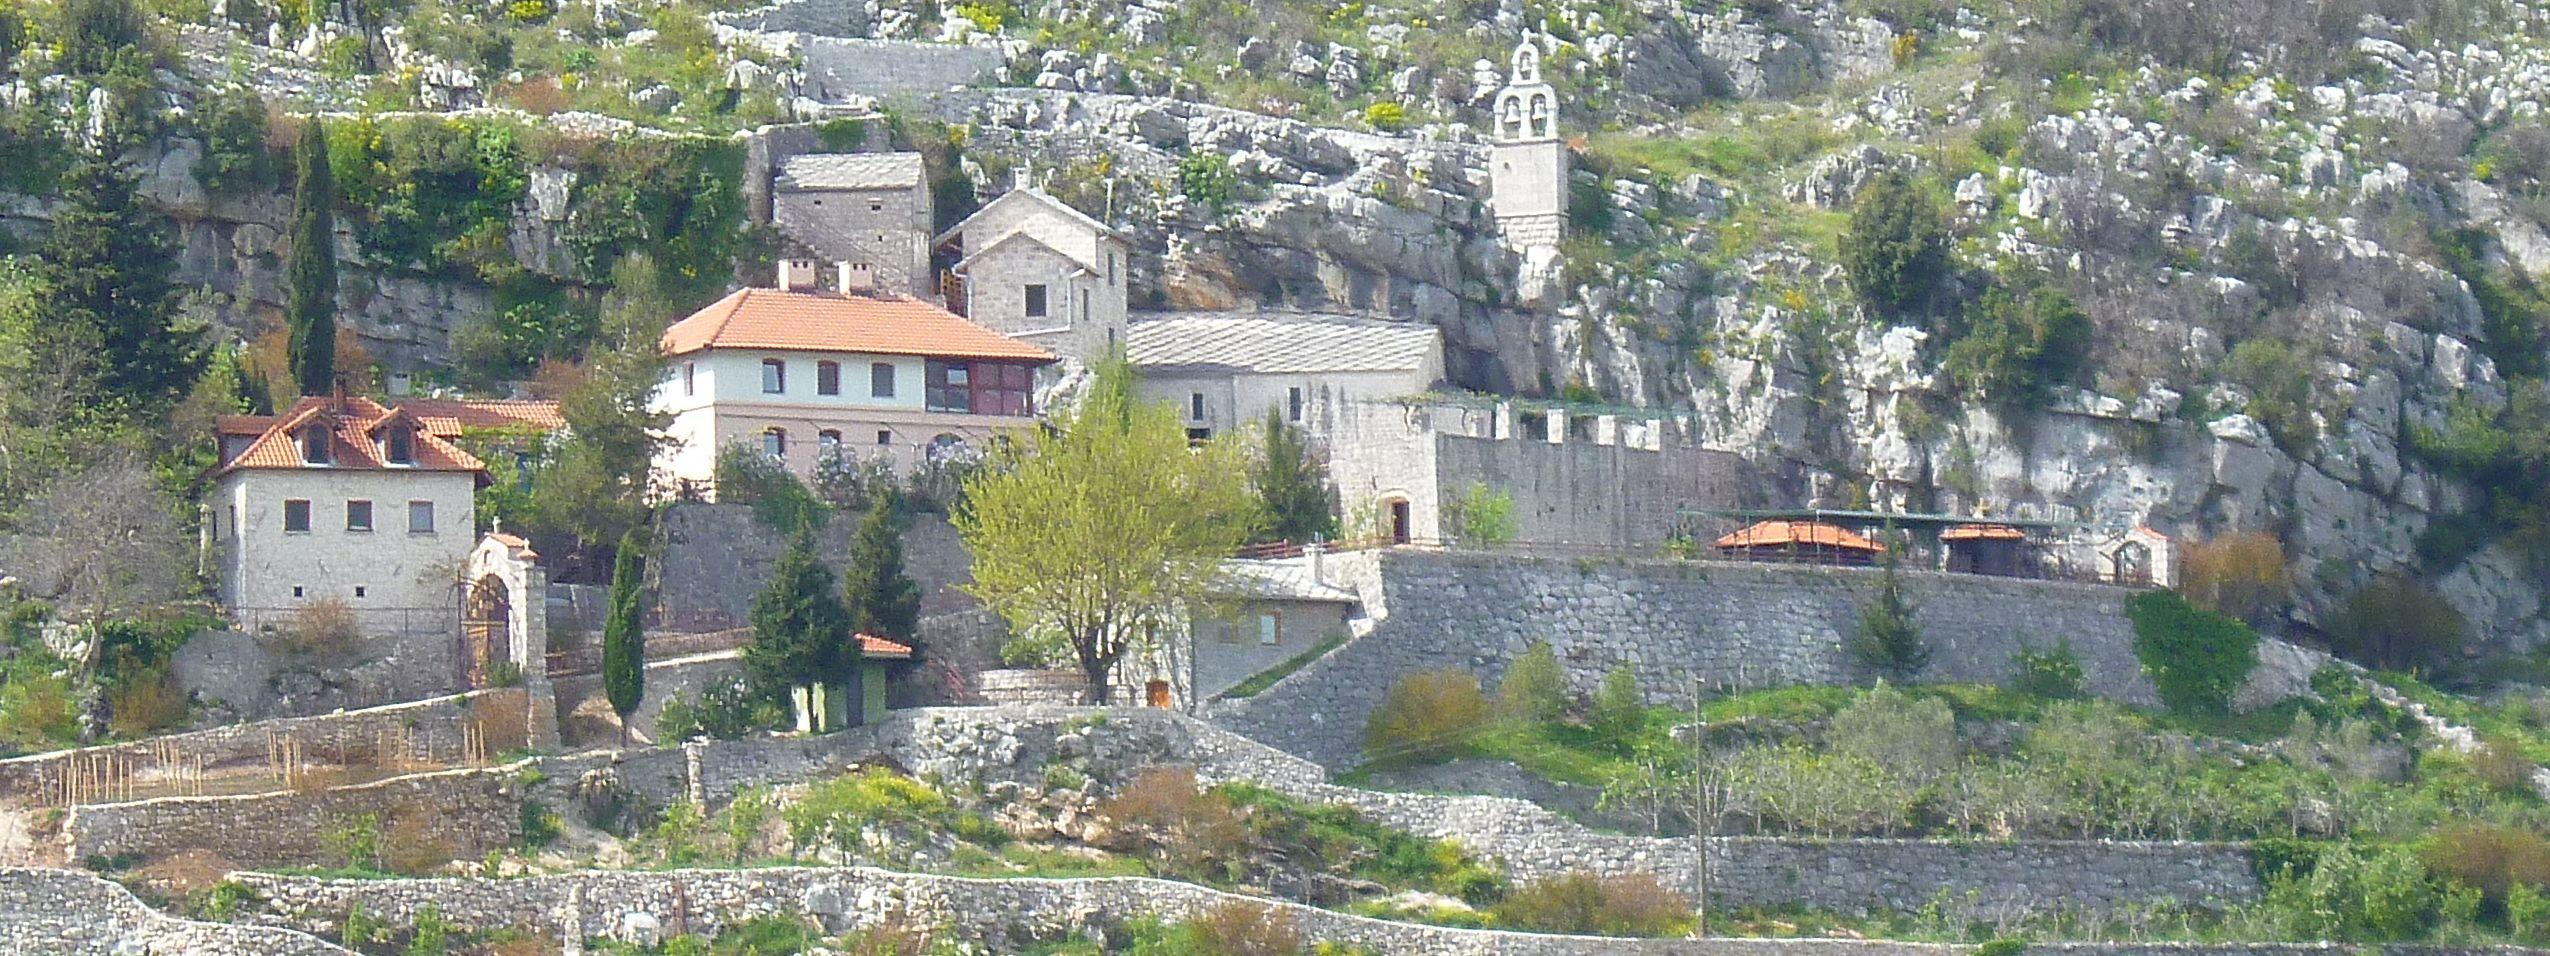 Монастырь Завала. Фото: Елена Арсениевич, CC BY-SA 3.0